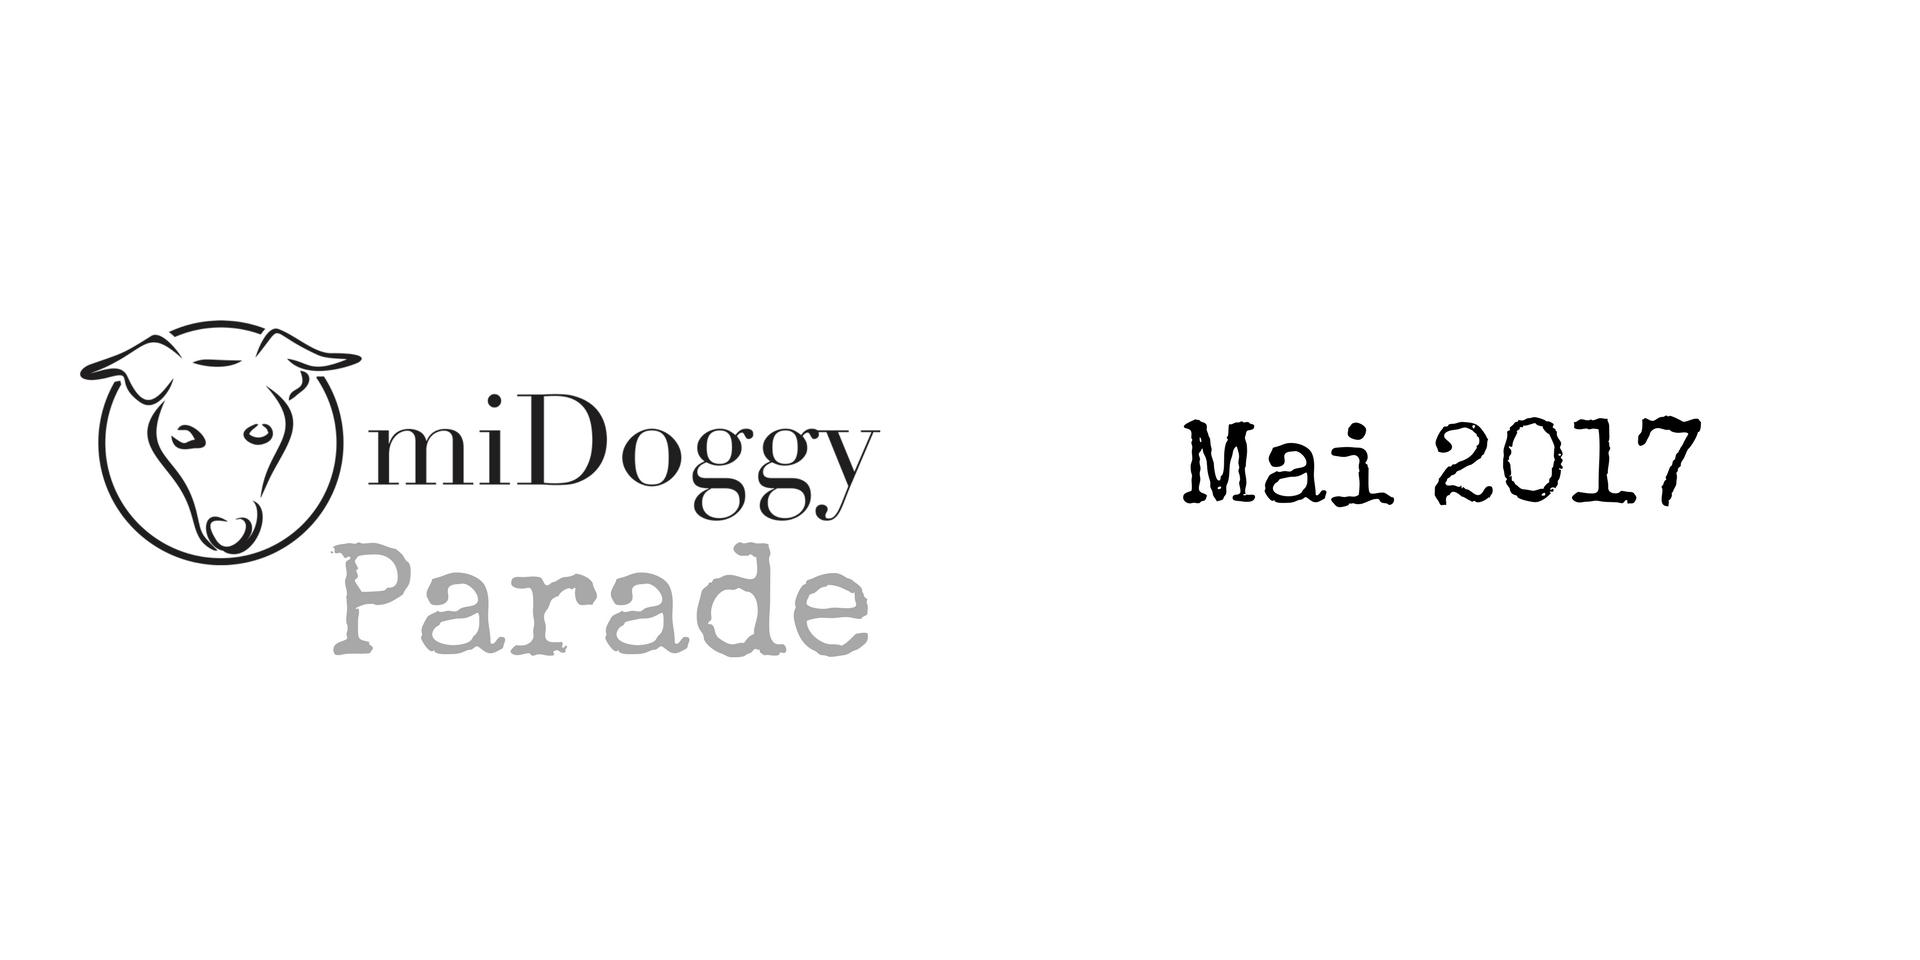 miDoggy Parade Blogparade Hundeblogger Mai 2017